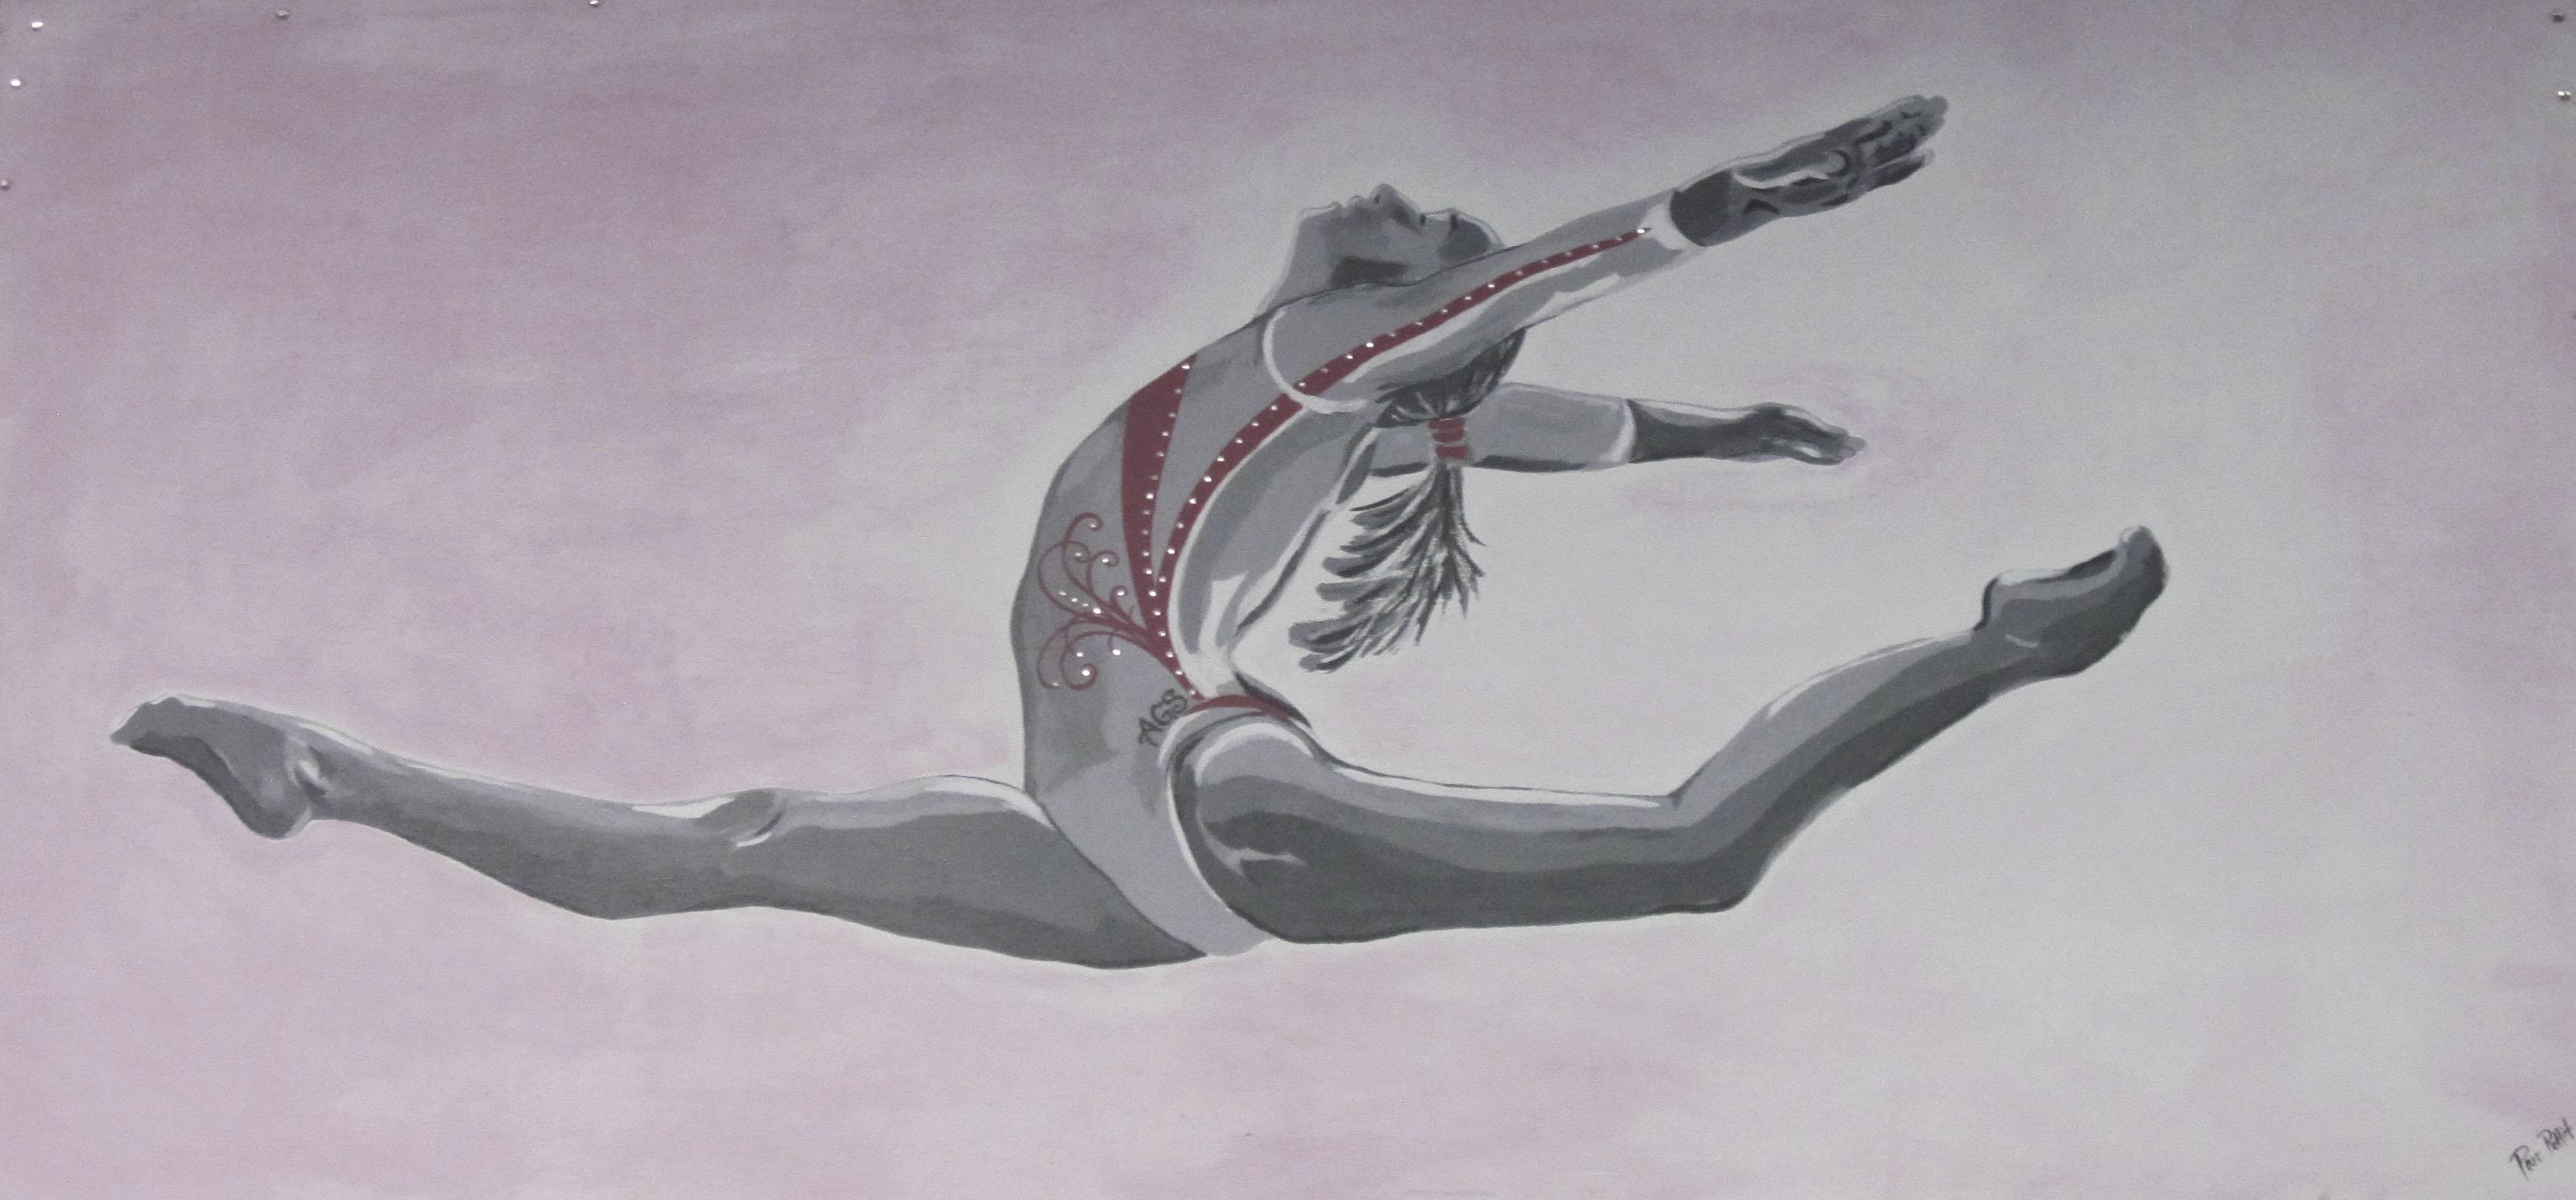 AGS gymnast art